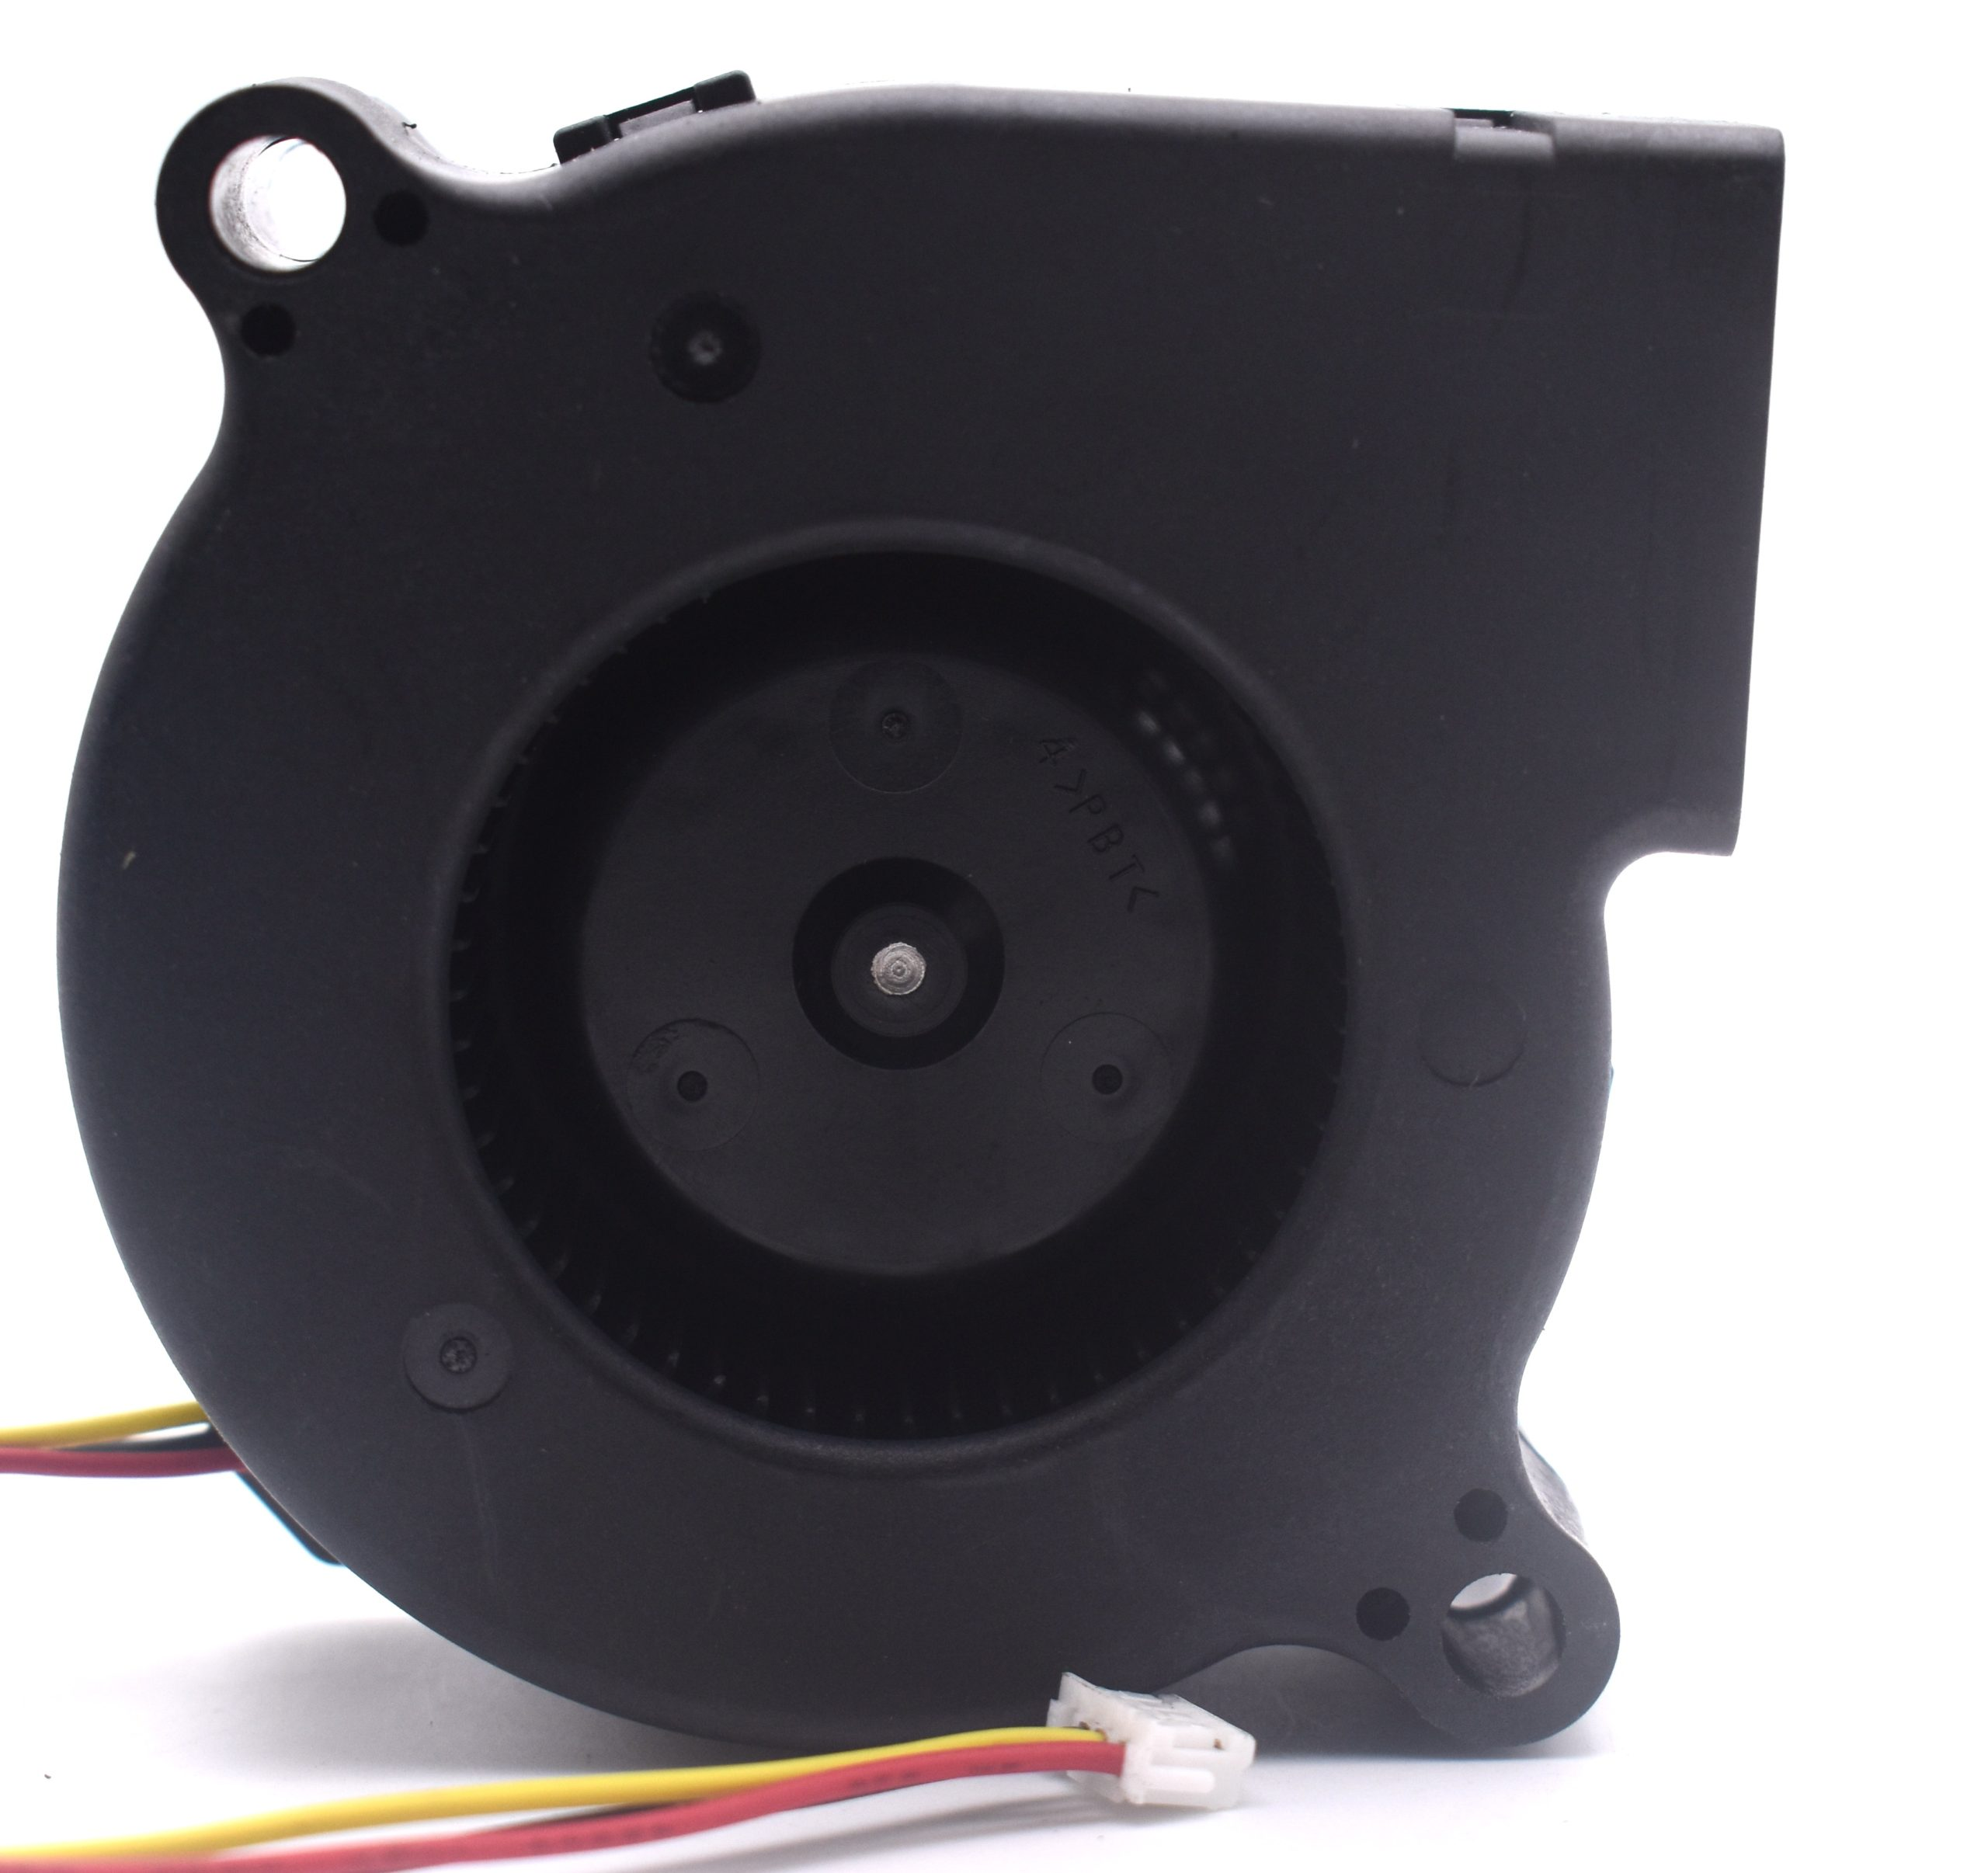 Nidec D06F-12B3S1 DC12V 0.33A 3.96W Double Ball Bearing  Cooling Fan